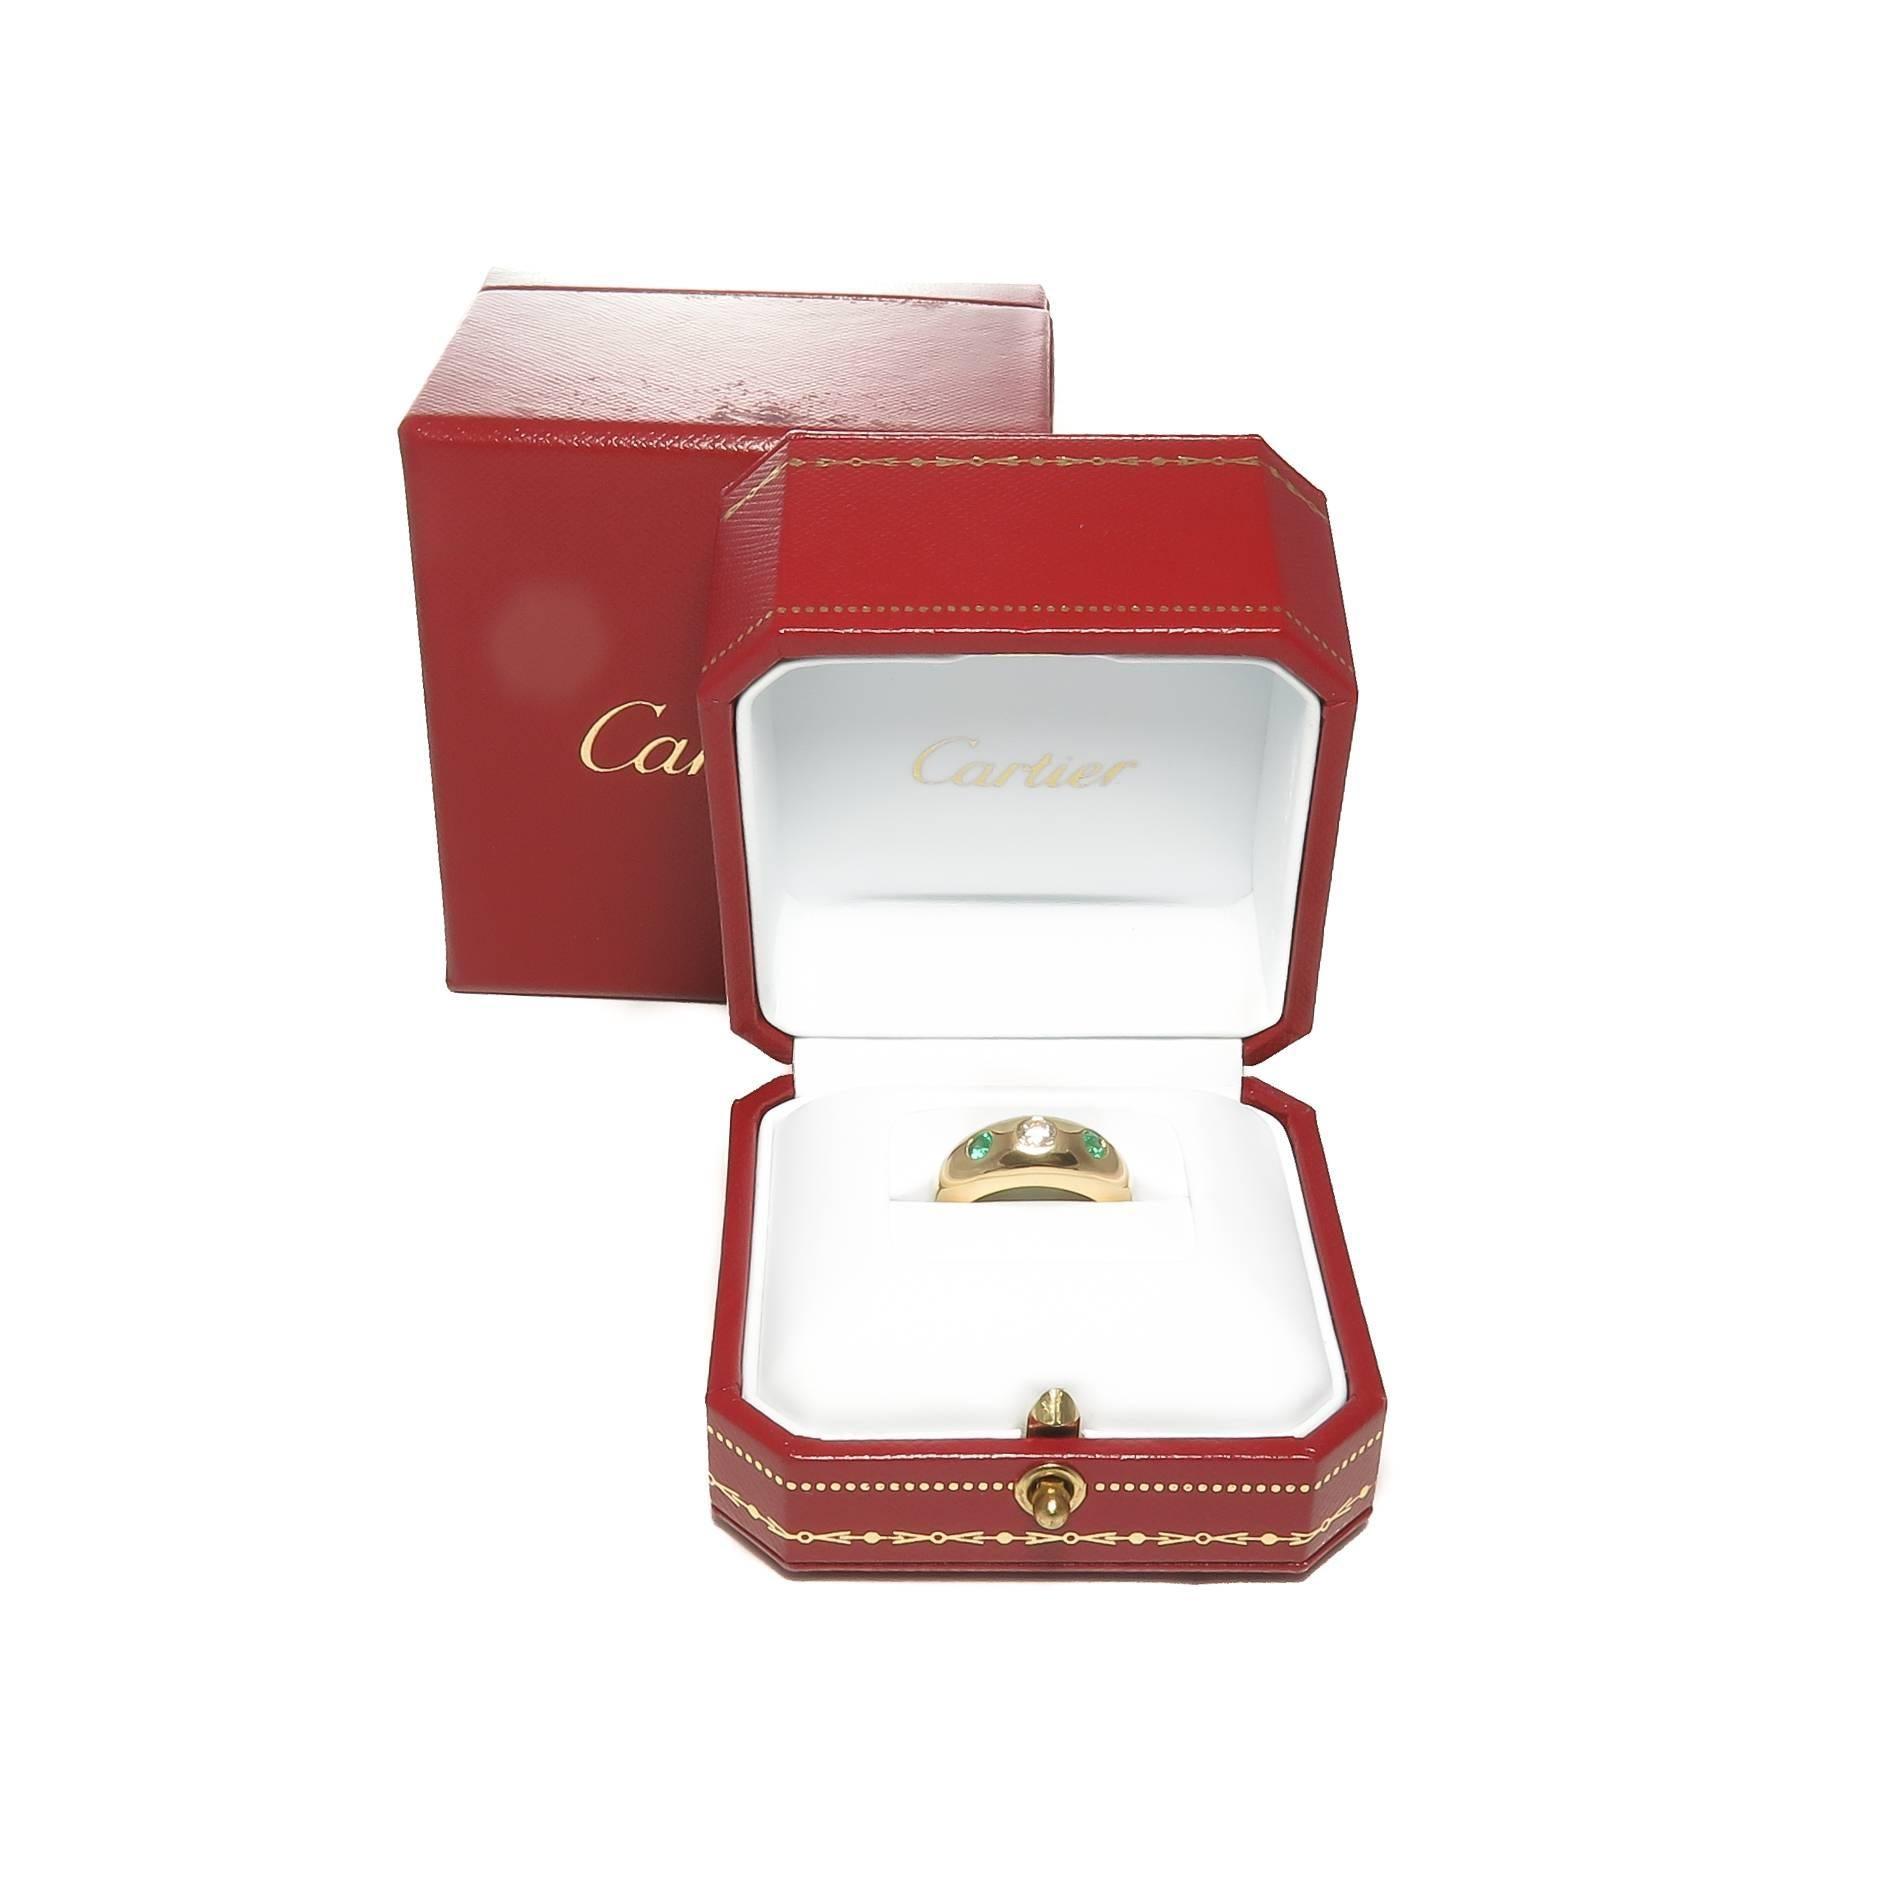 Cartier 3 rings